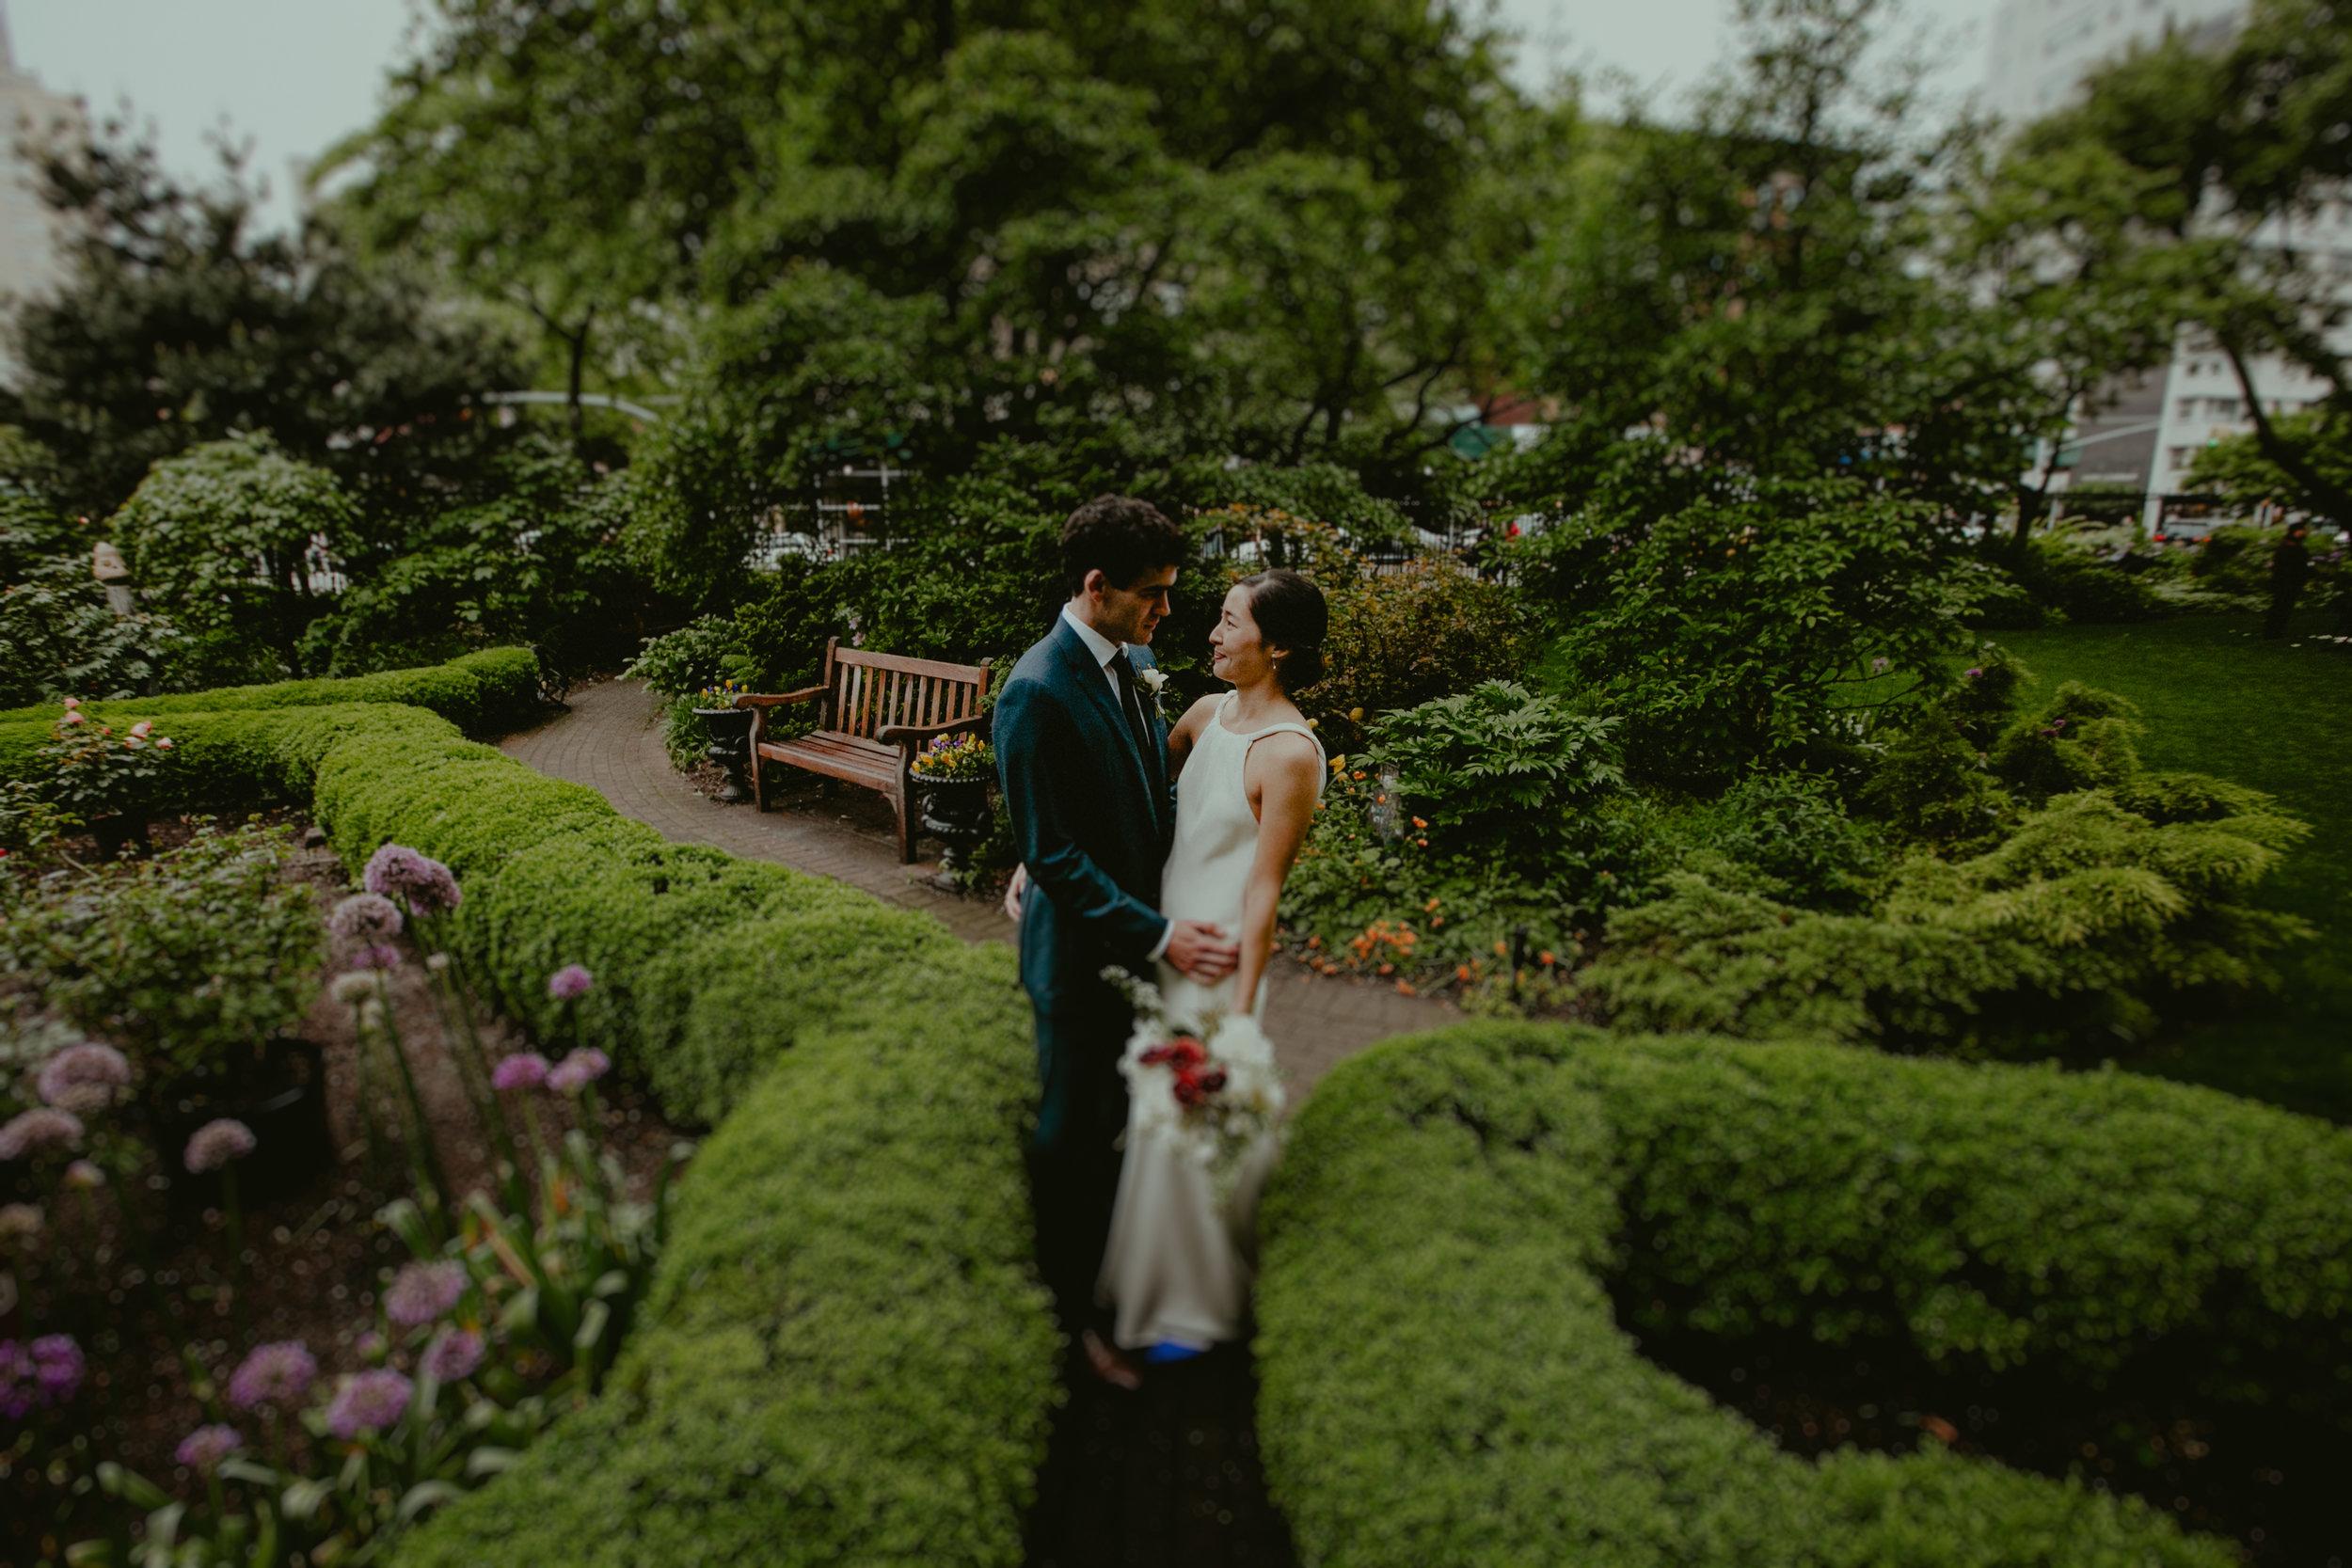 beekman hotel 473jefferson garden market wedding.JPG